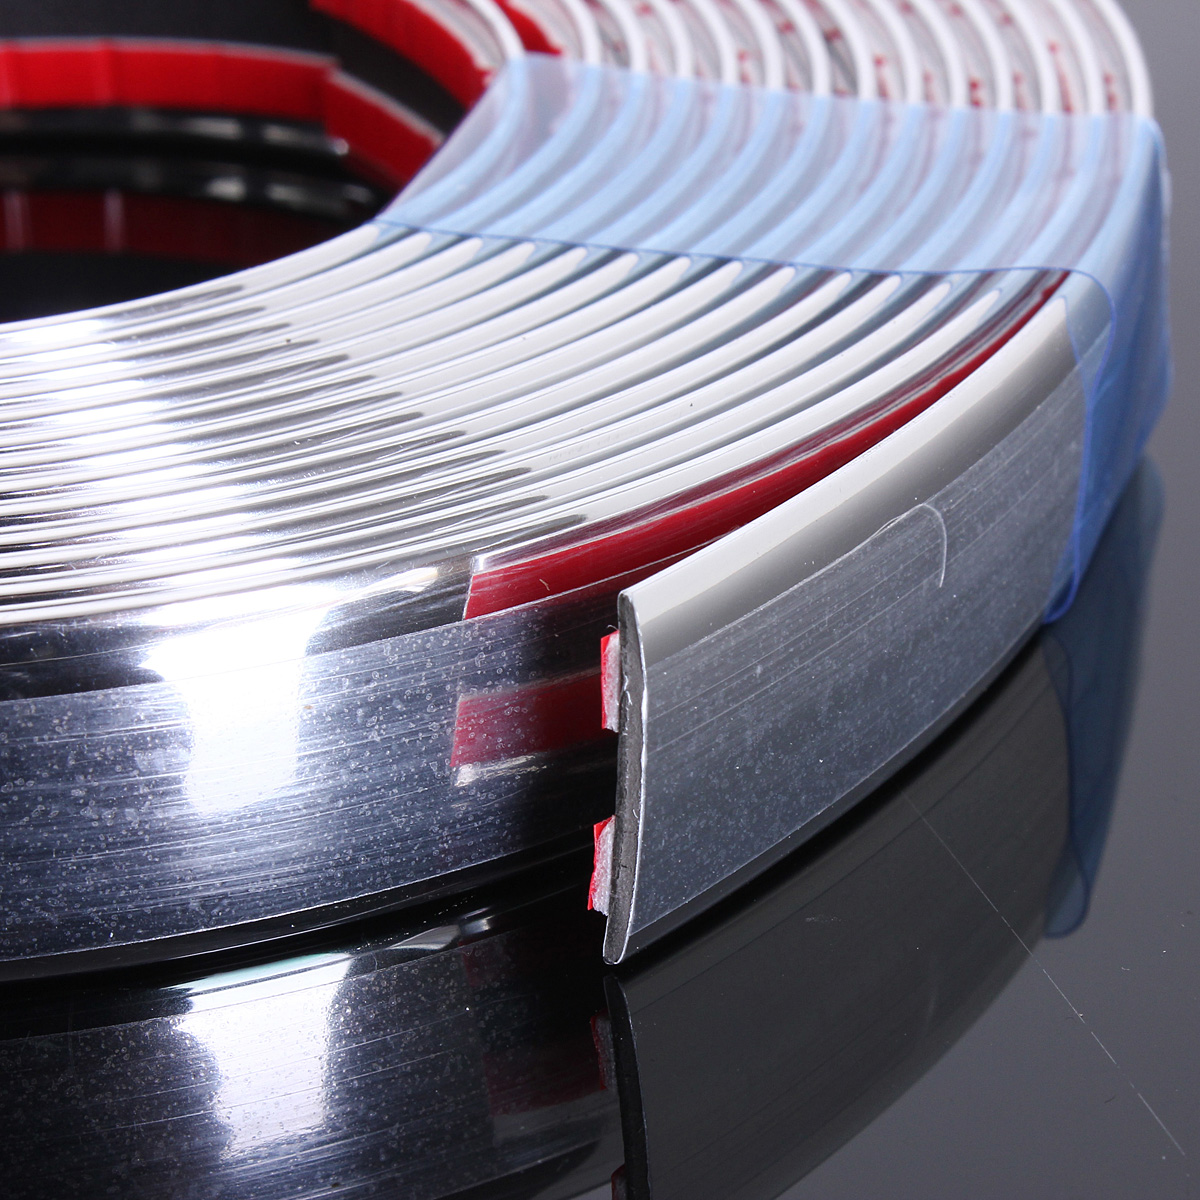 20mm 5m chrome car styling moulding strip trim self adhesive crash protector van. Black Bedroom Furniture Sets. Home Design Ideas